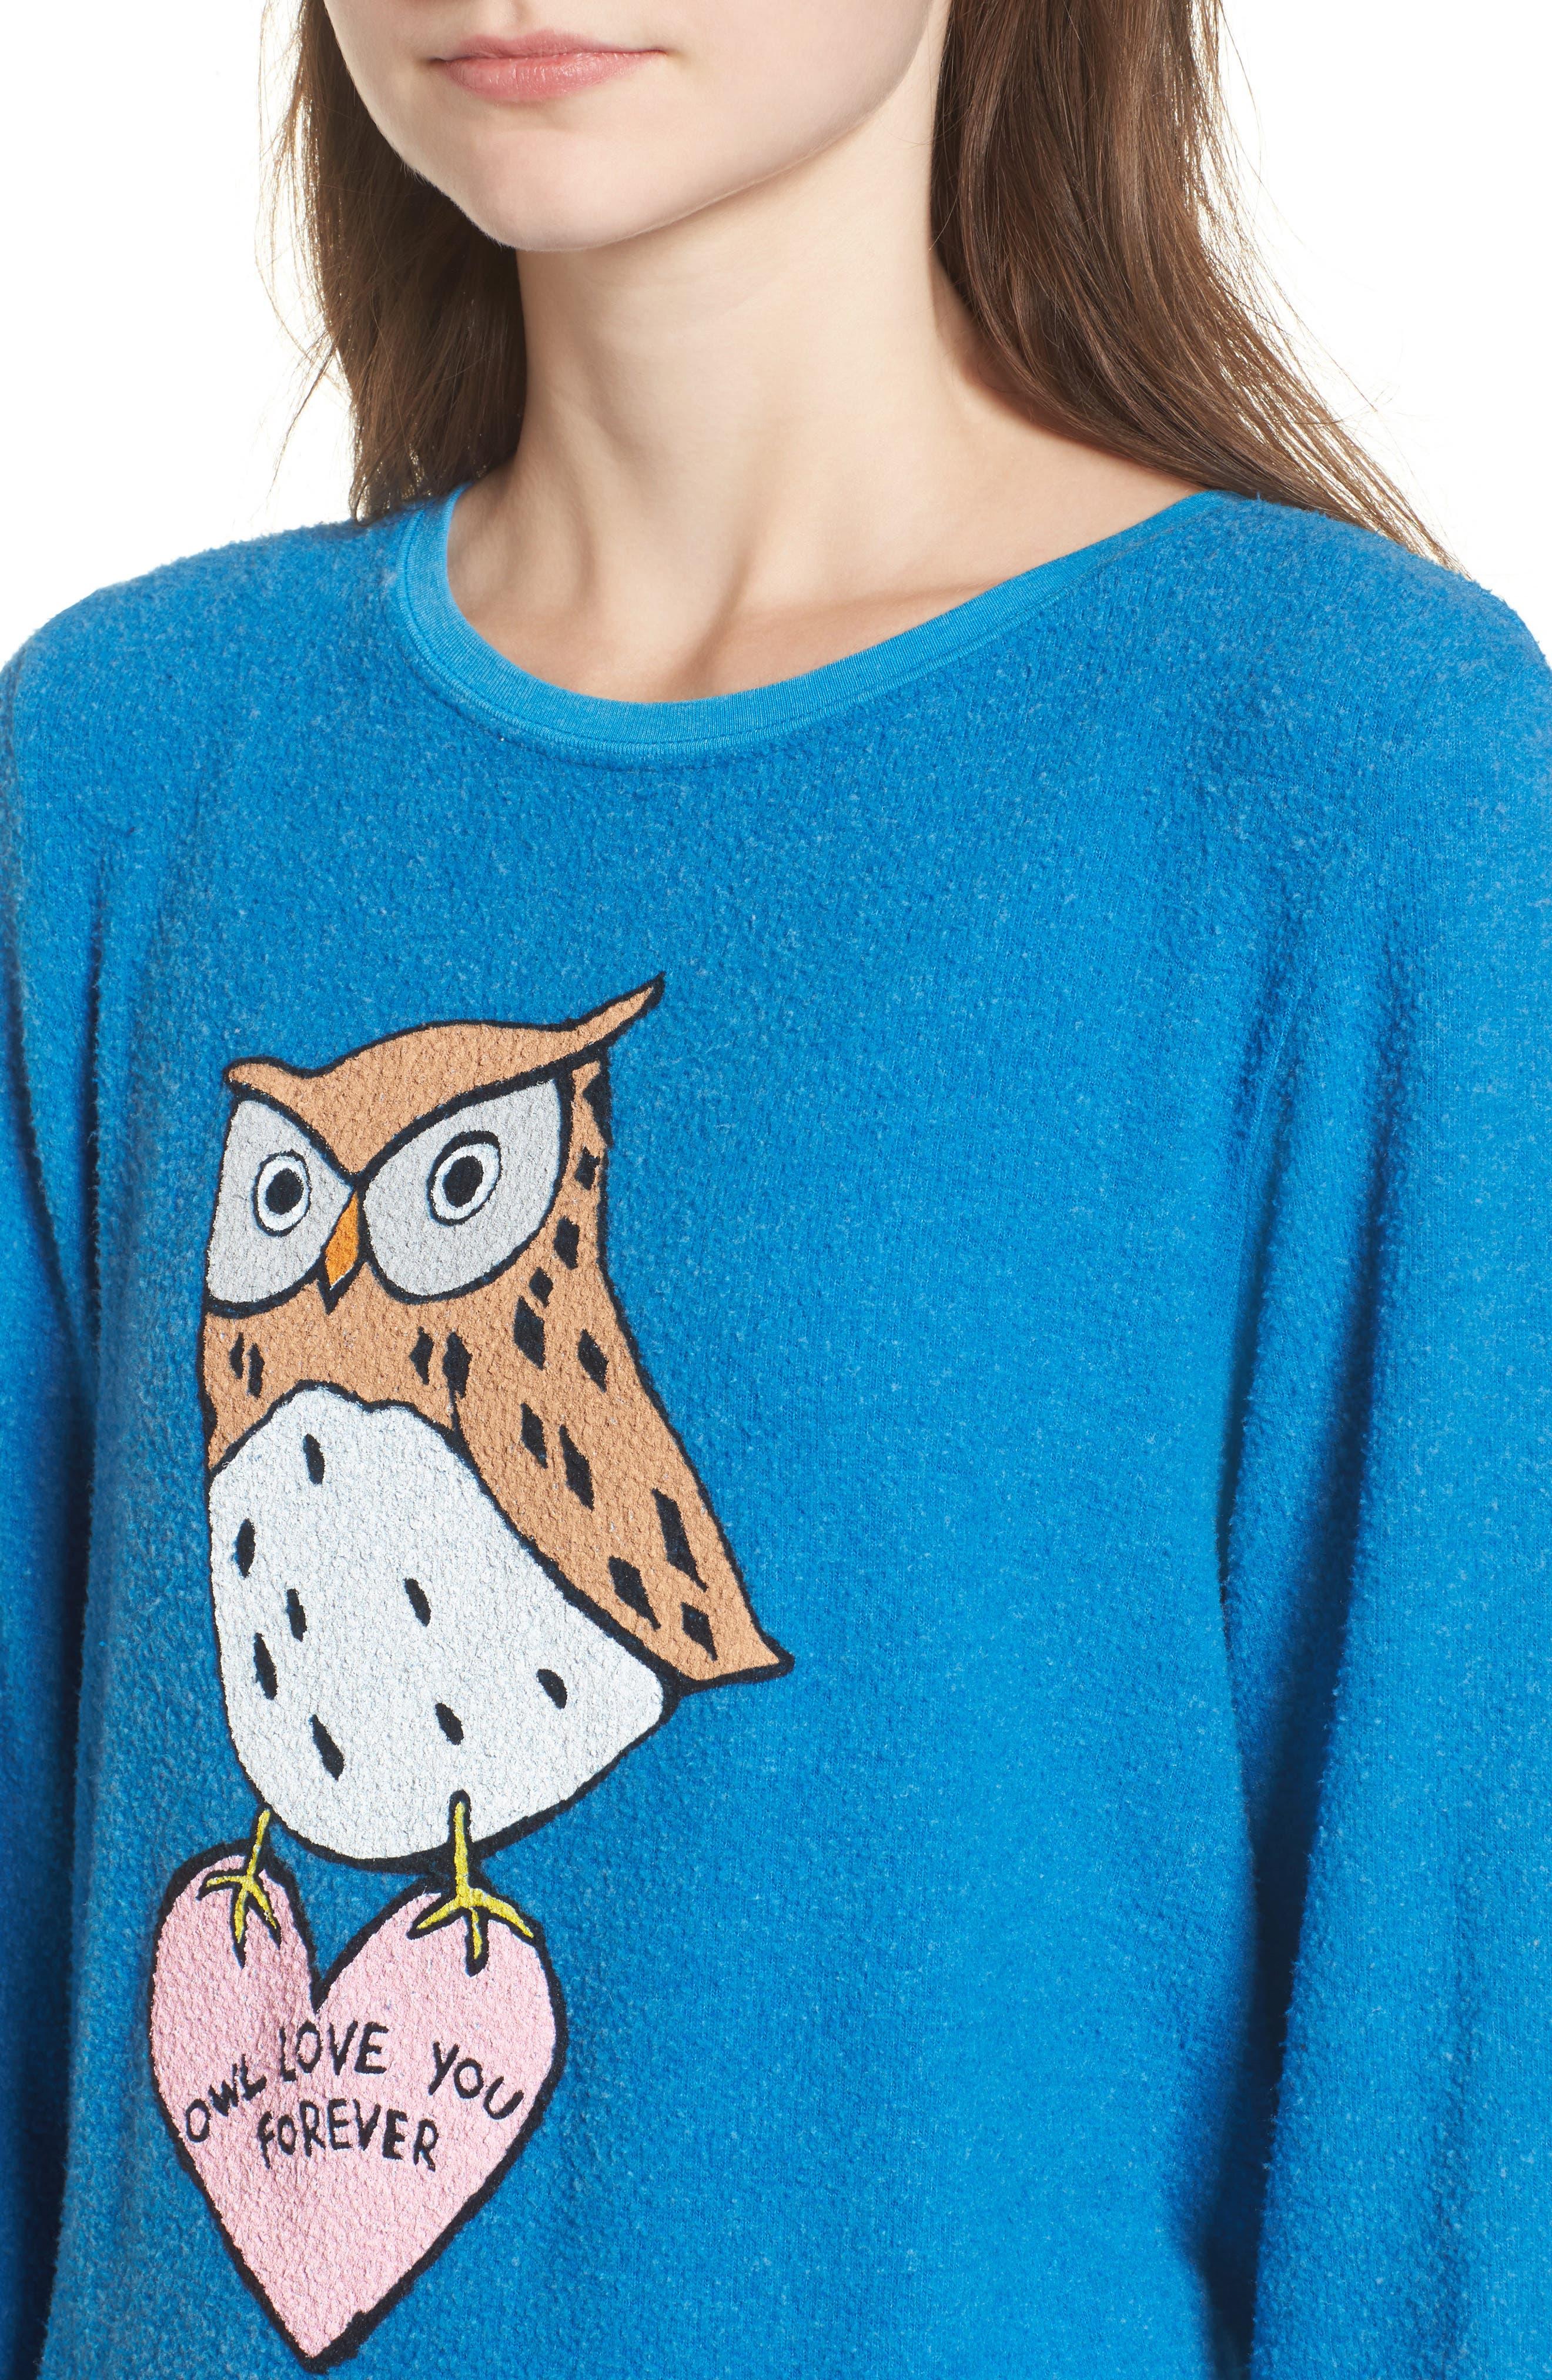 Owl Love You Forever Sweatshirt,                             Alternate thumbnail 4, color,                             Cobalt Sea